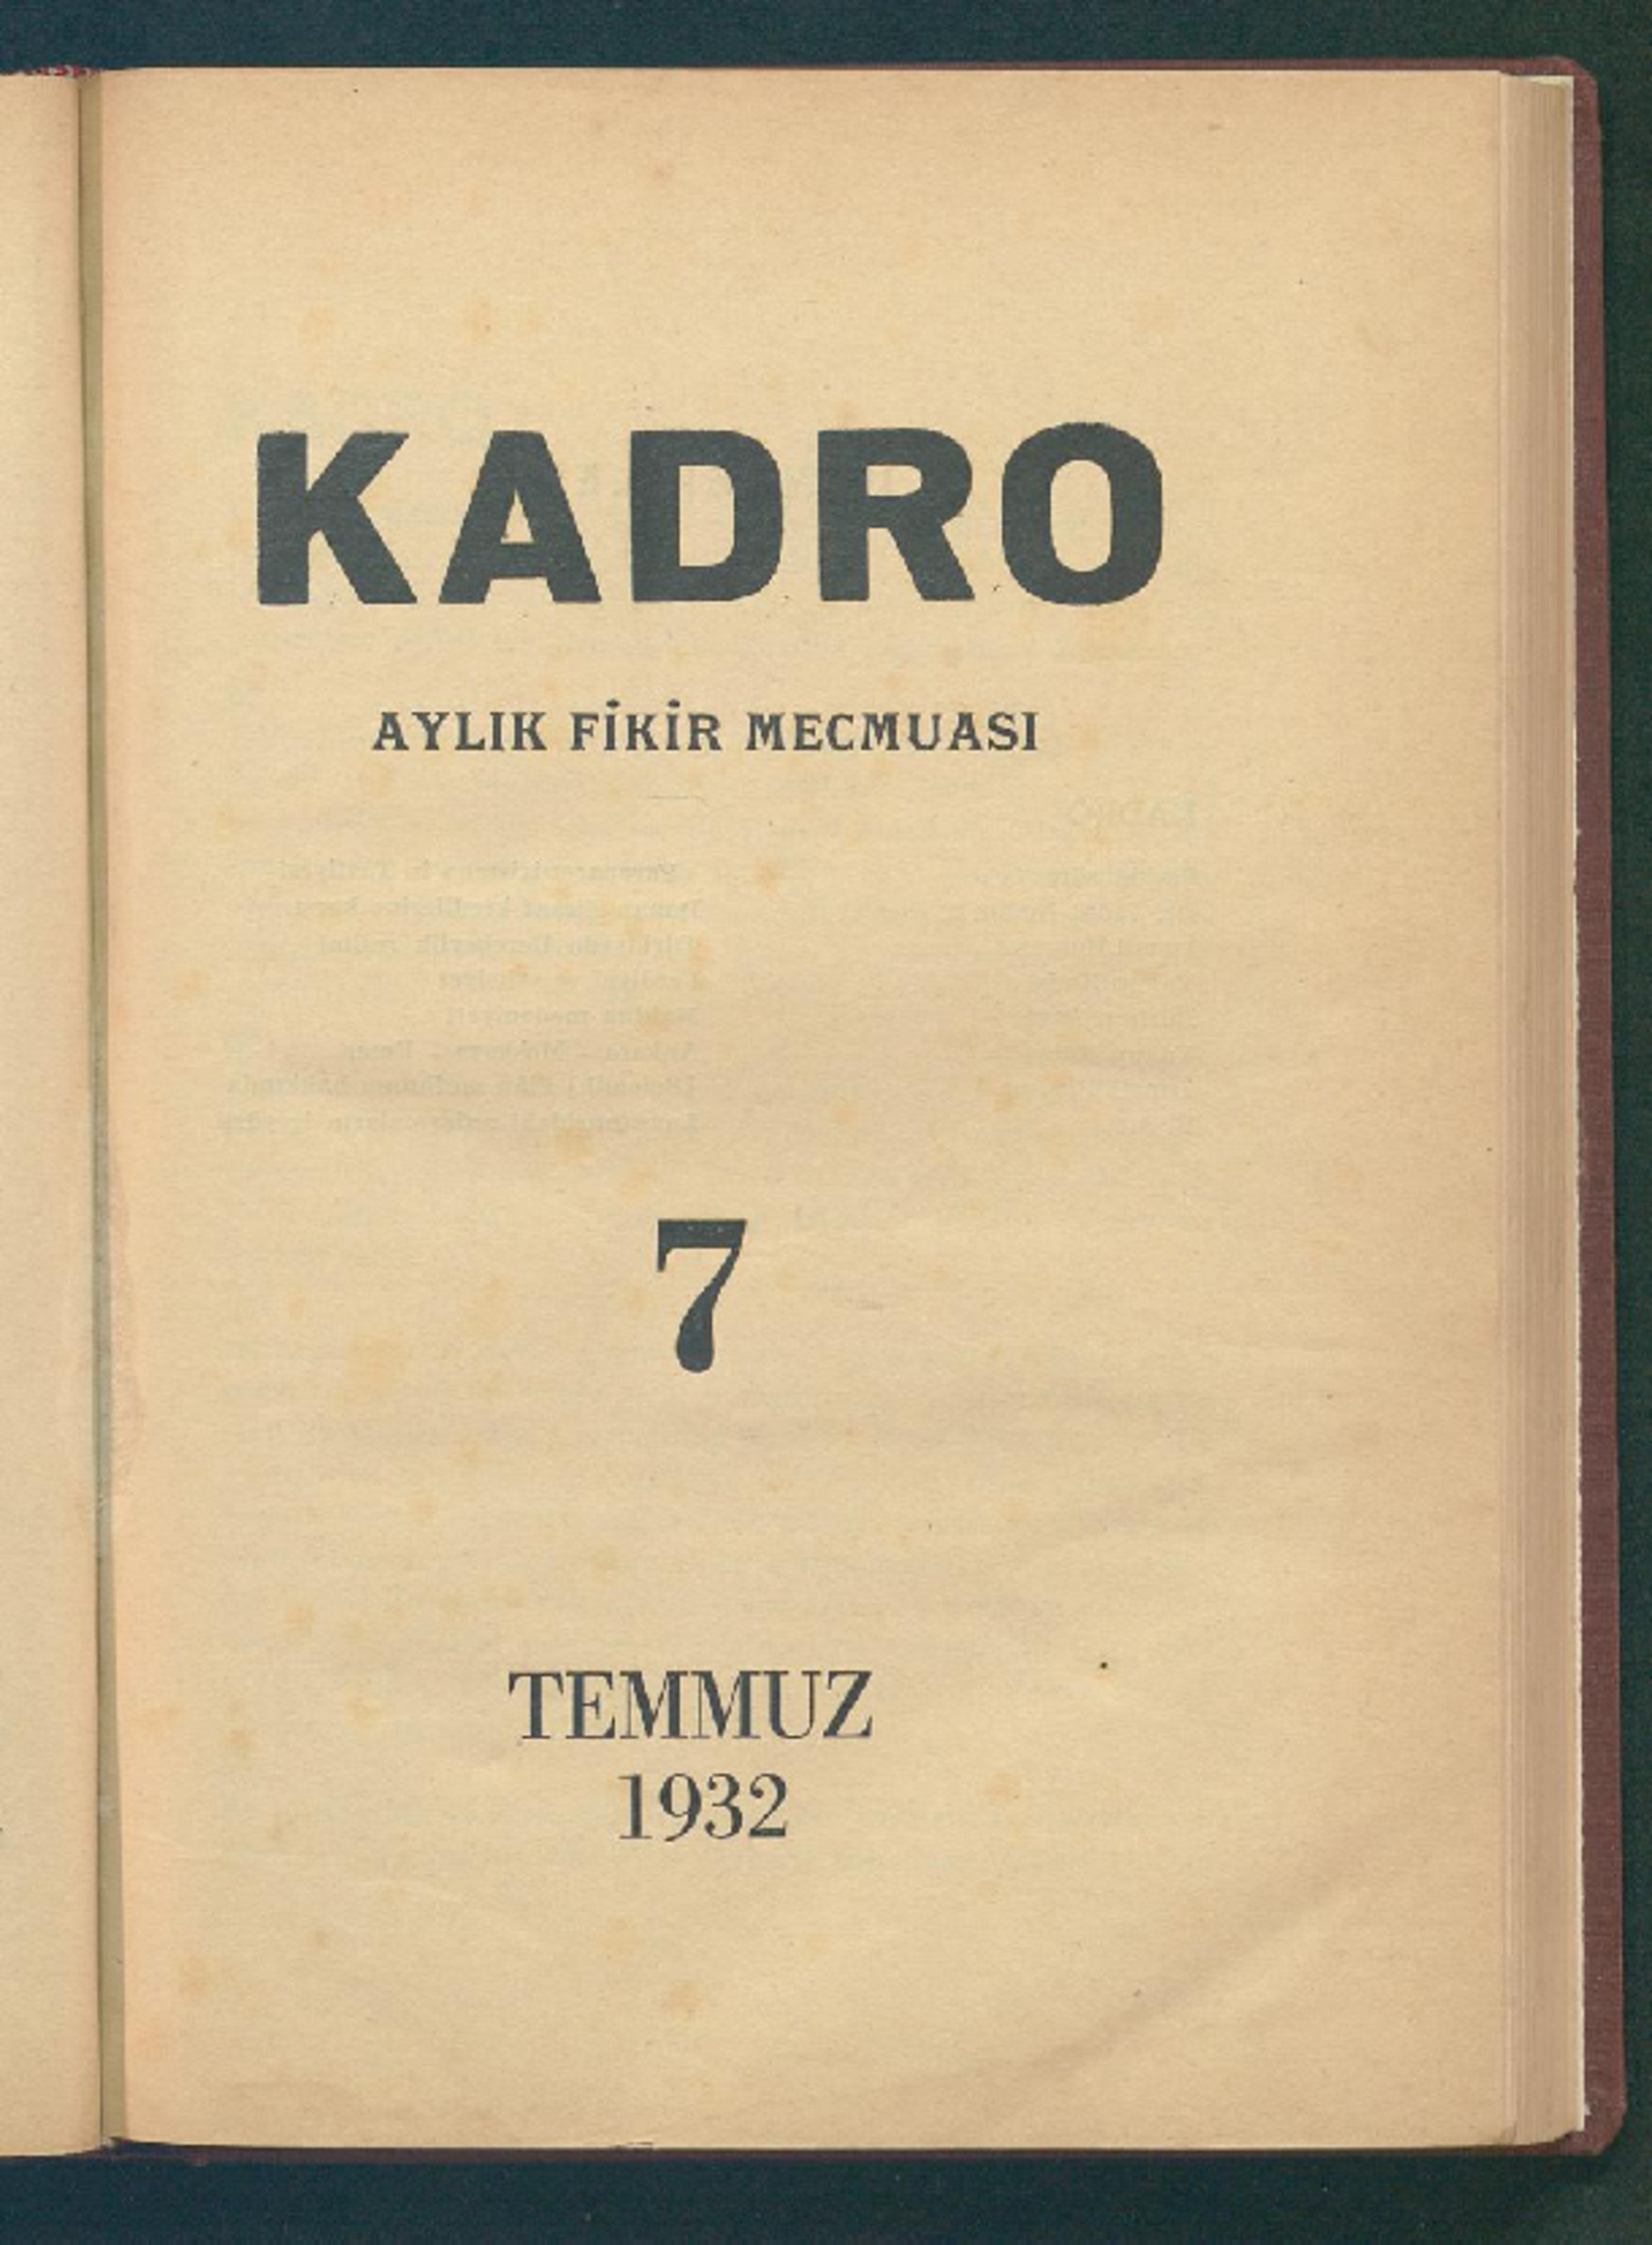 1 Temmuz 1932 Tarihli Kadro Dergisi Sayfa 1